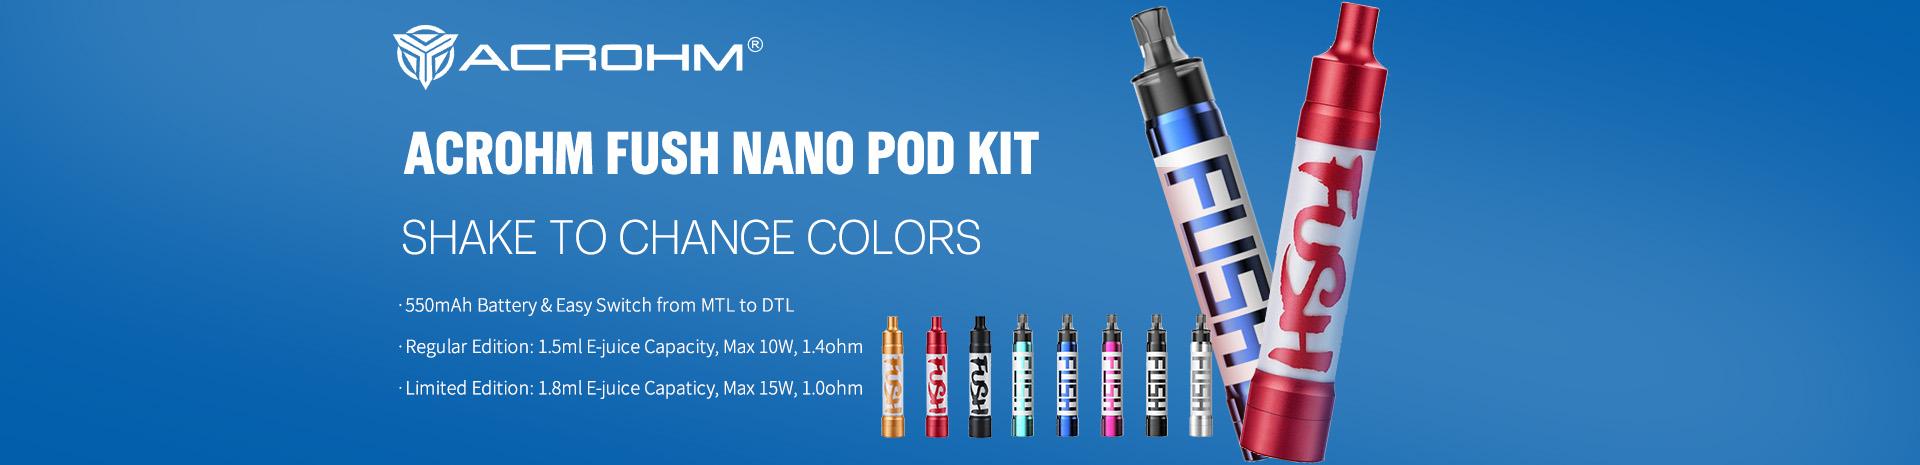 Acrohm Fush Nano Pod Kit Shake to change colors